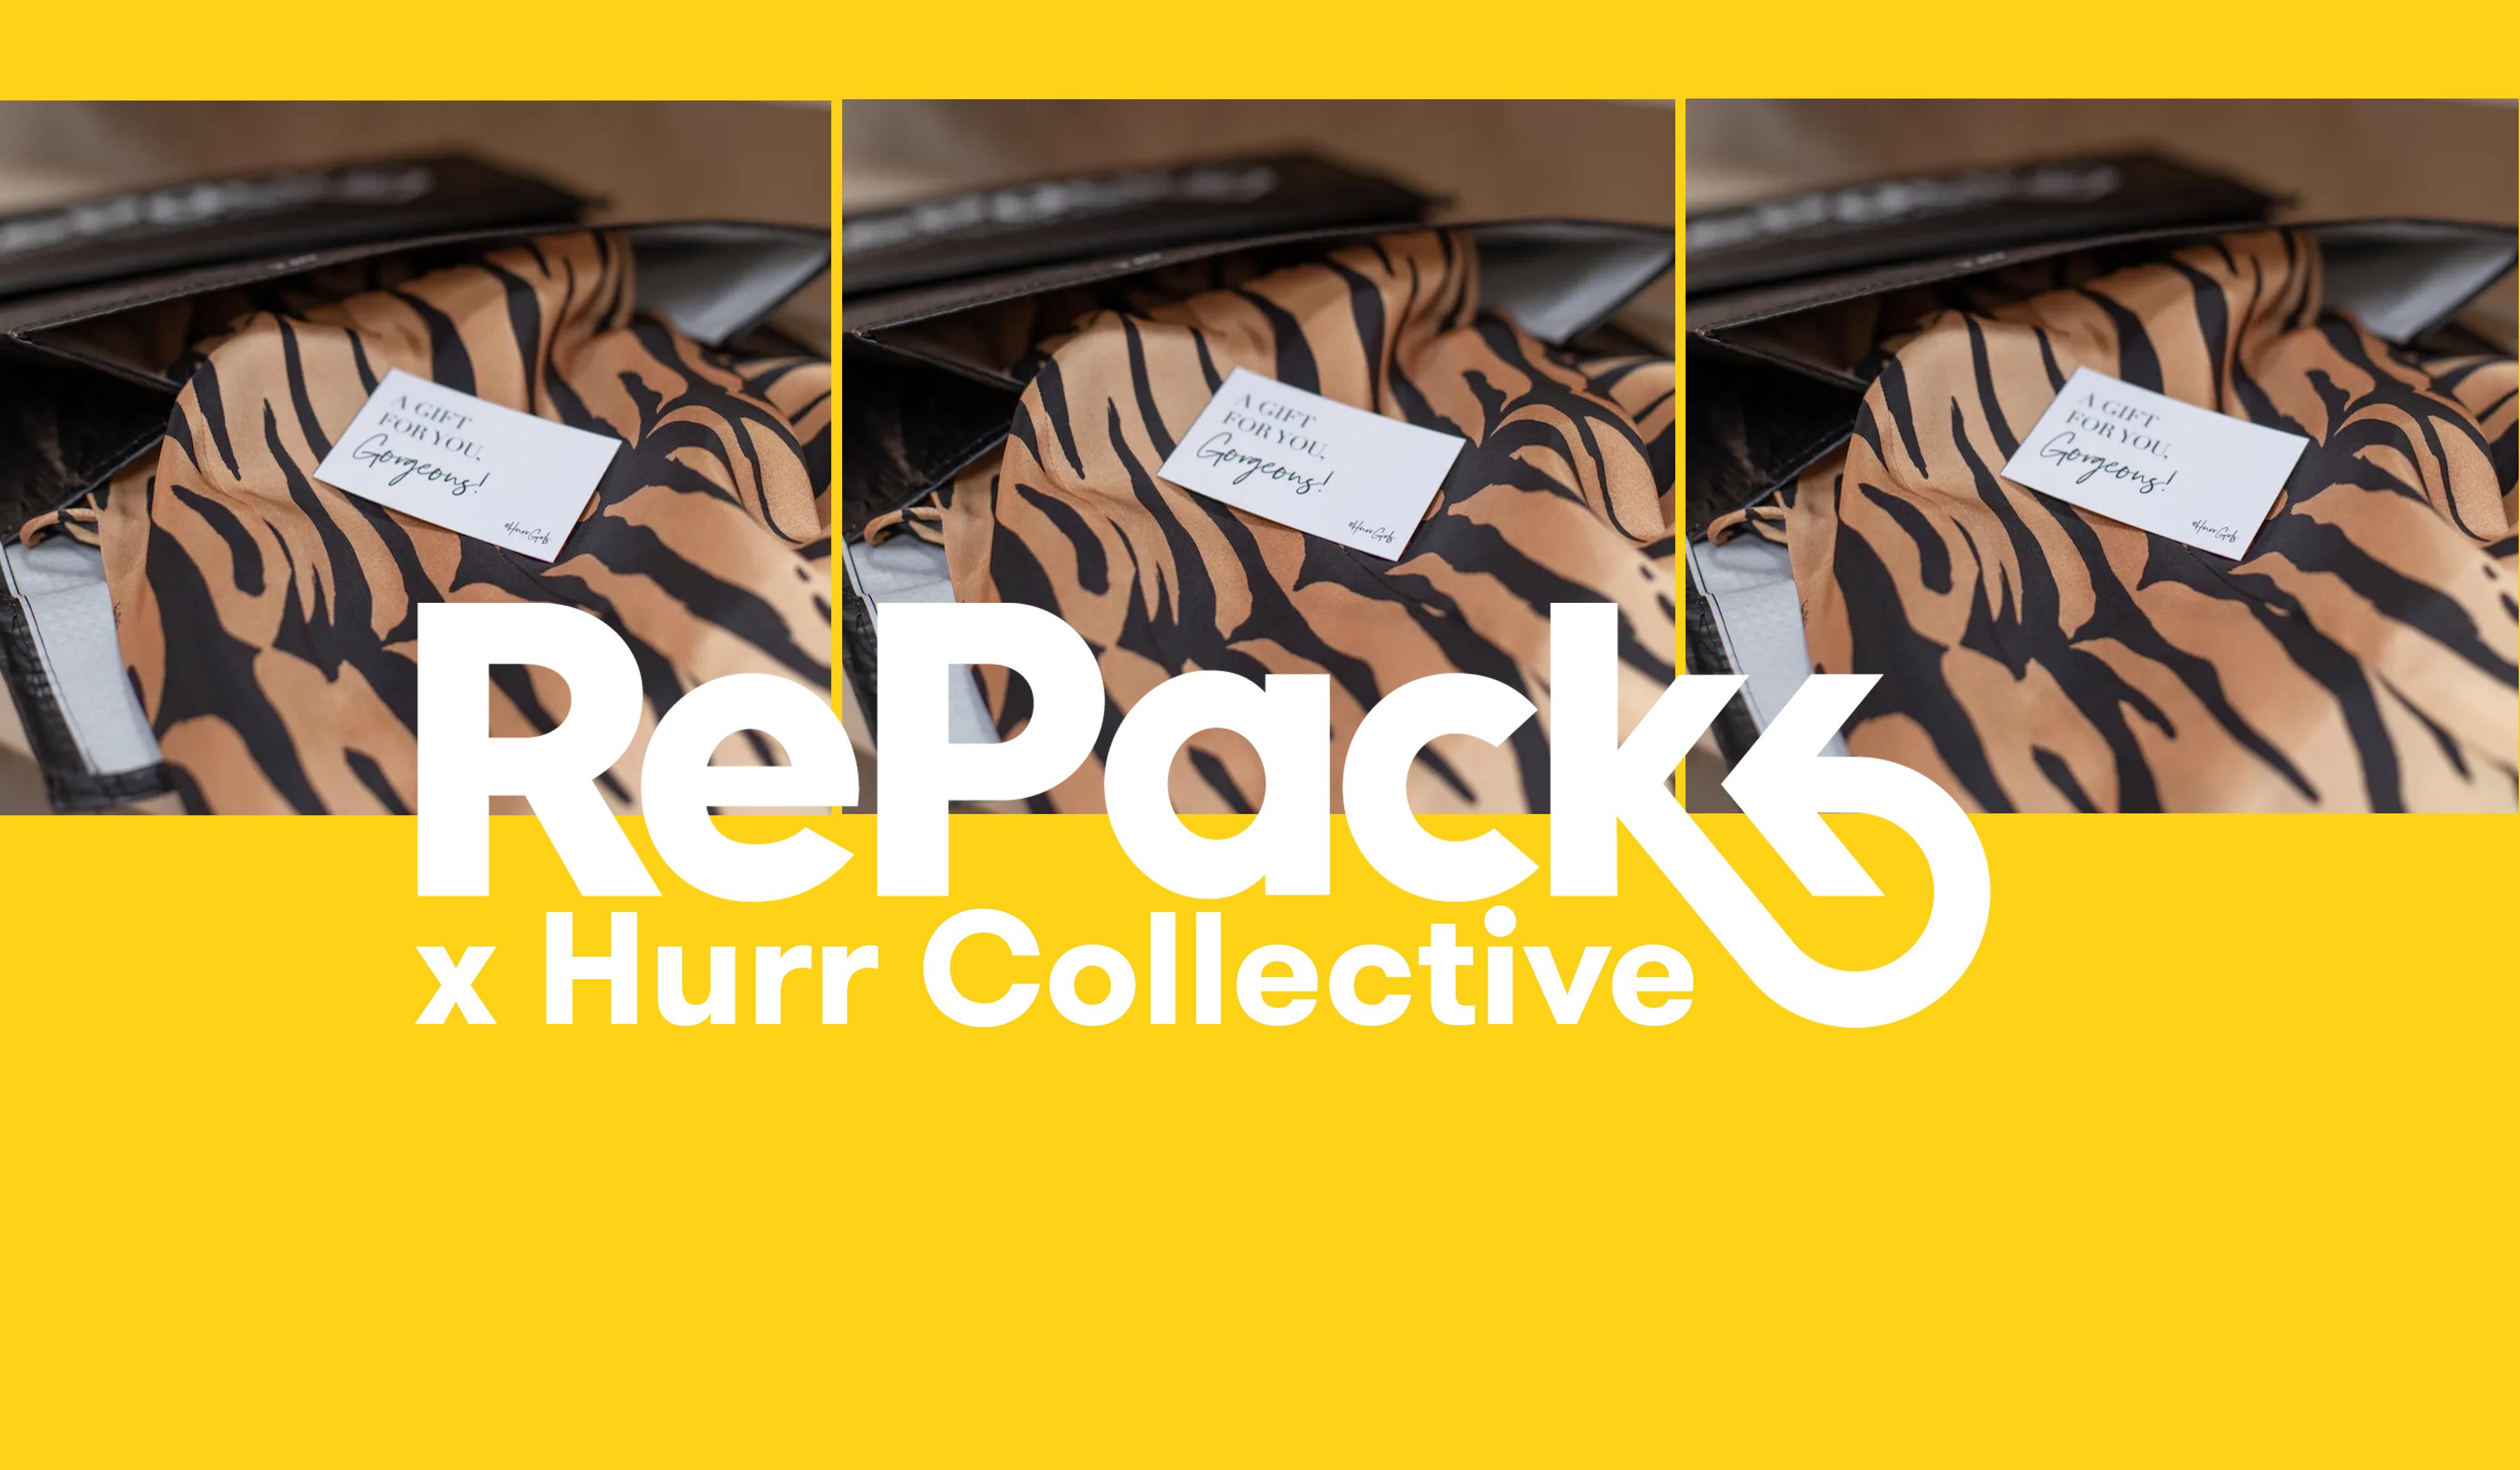 HURR x RePack - If you like it, rent it.